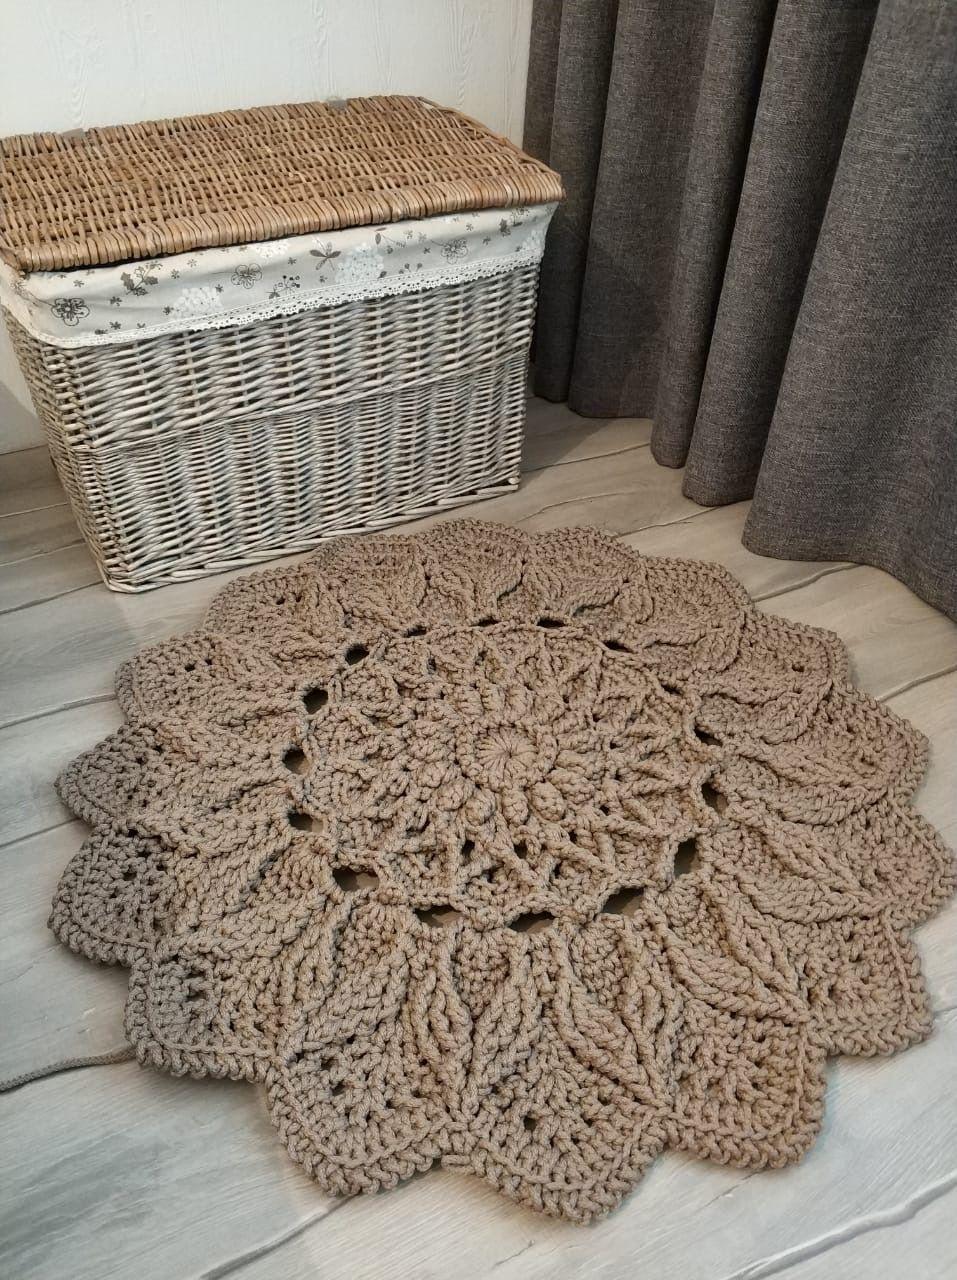 Video Tutorial Crocheting Rug Elven Patterns Etsy In 2020 Rug Pattern Crochet Rug Patterns Rag Rug Tutorial